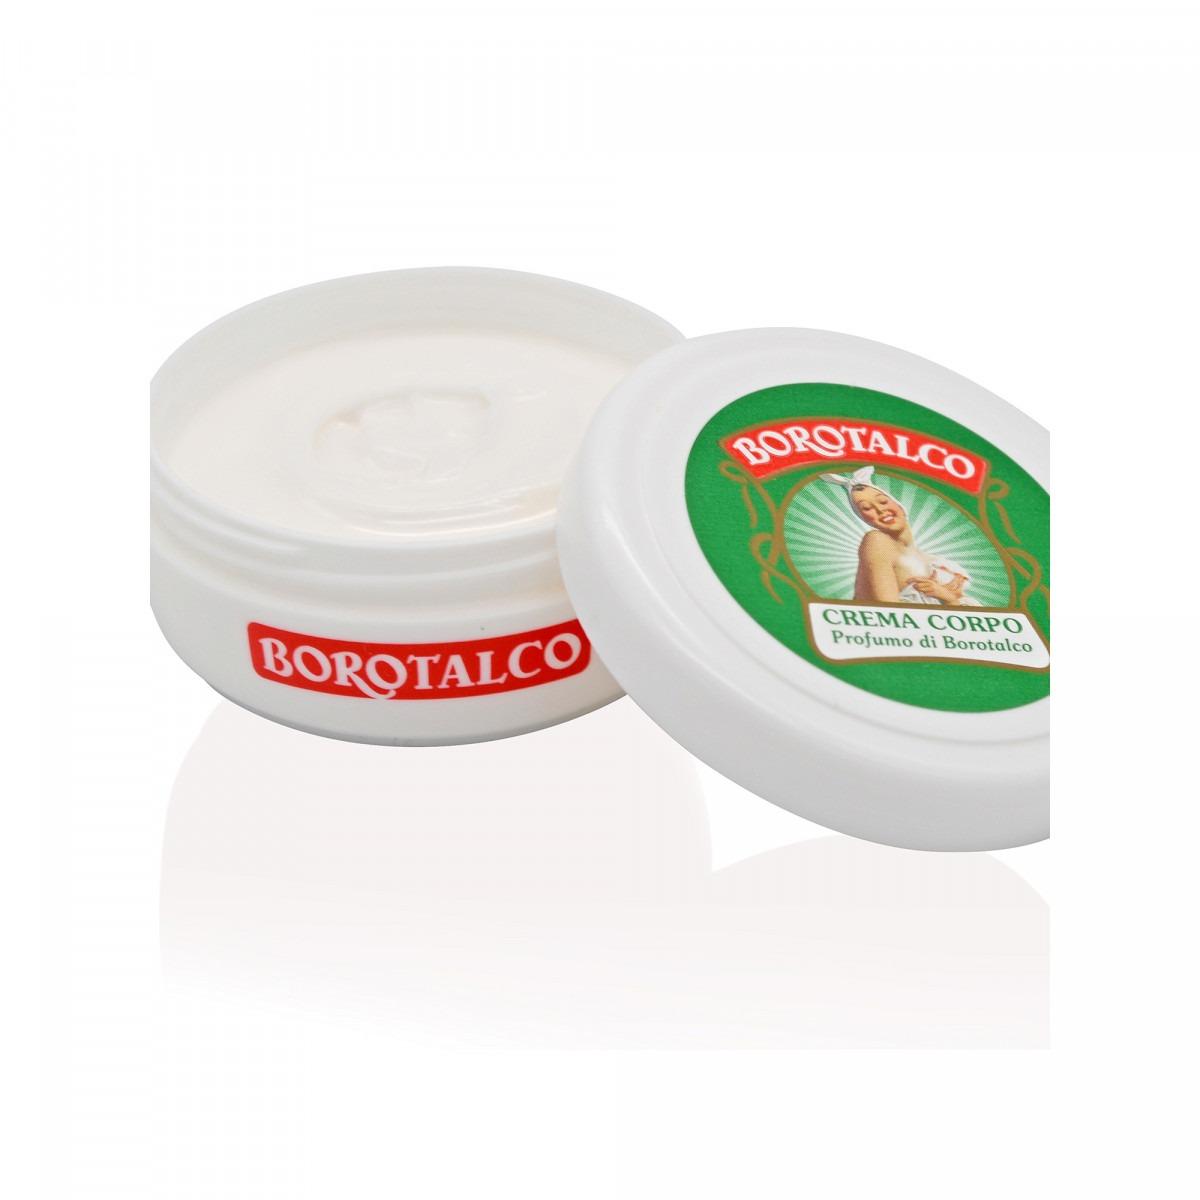 Borotalco Body Cream 30ml